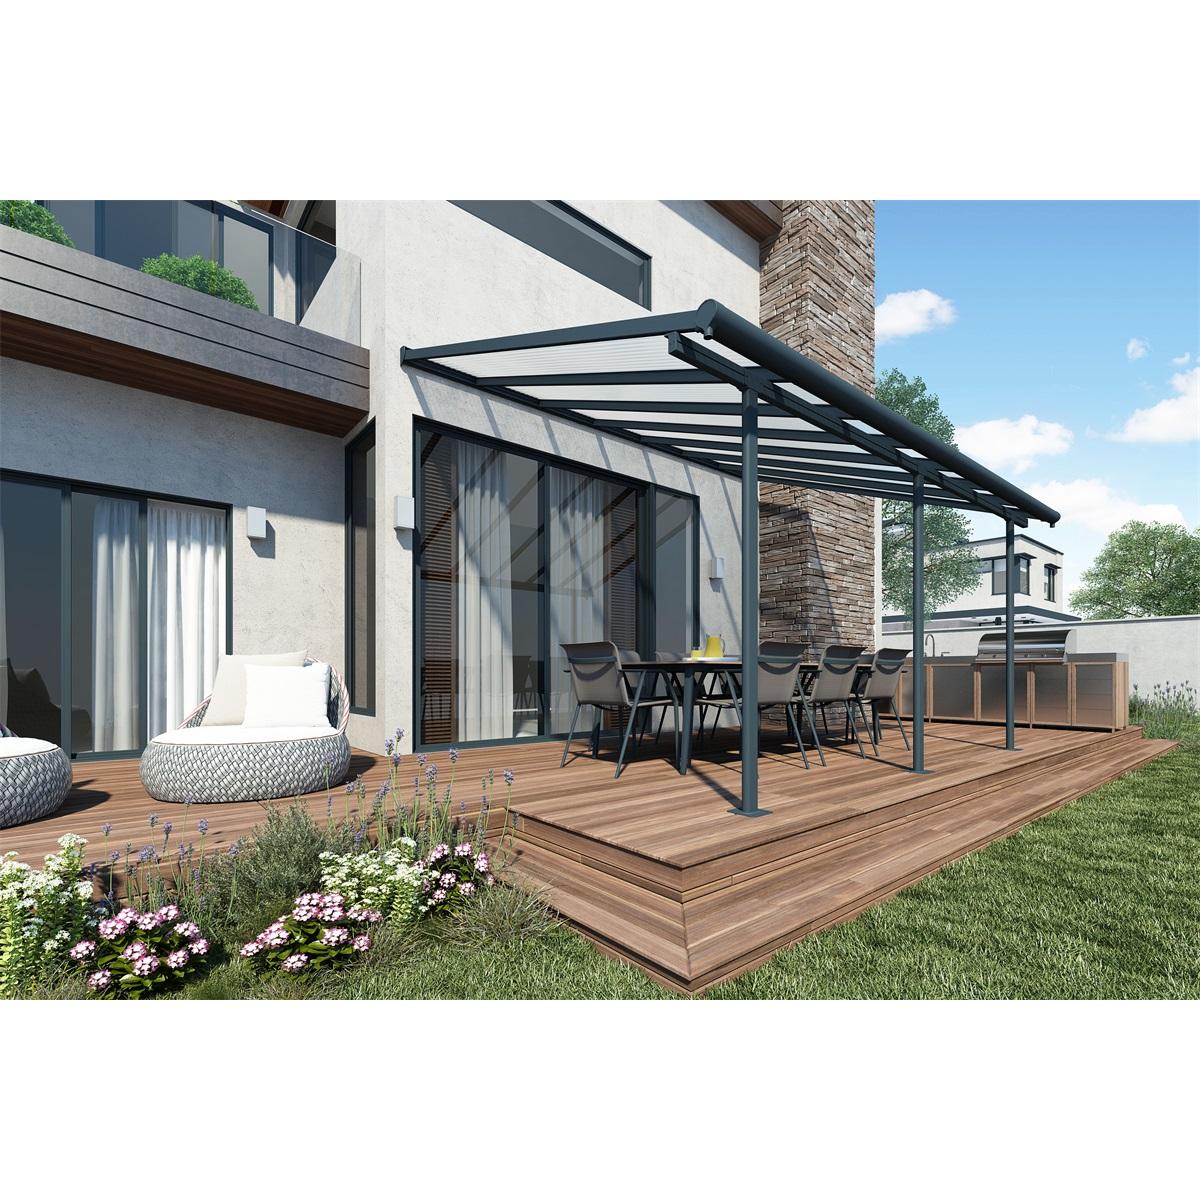 sierra 4200 ed 3 x 4 25 hlin kov montovan pergola garland s r o. Black Bedroom Furniture Sets. Home Design Ideas